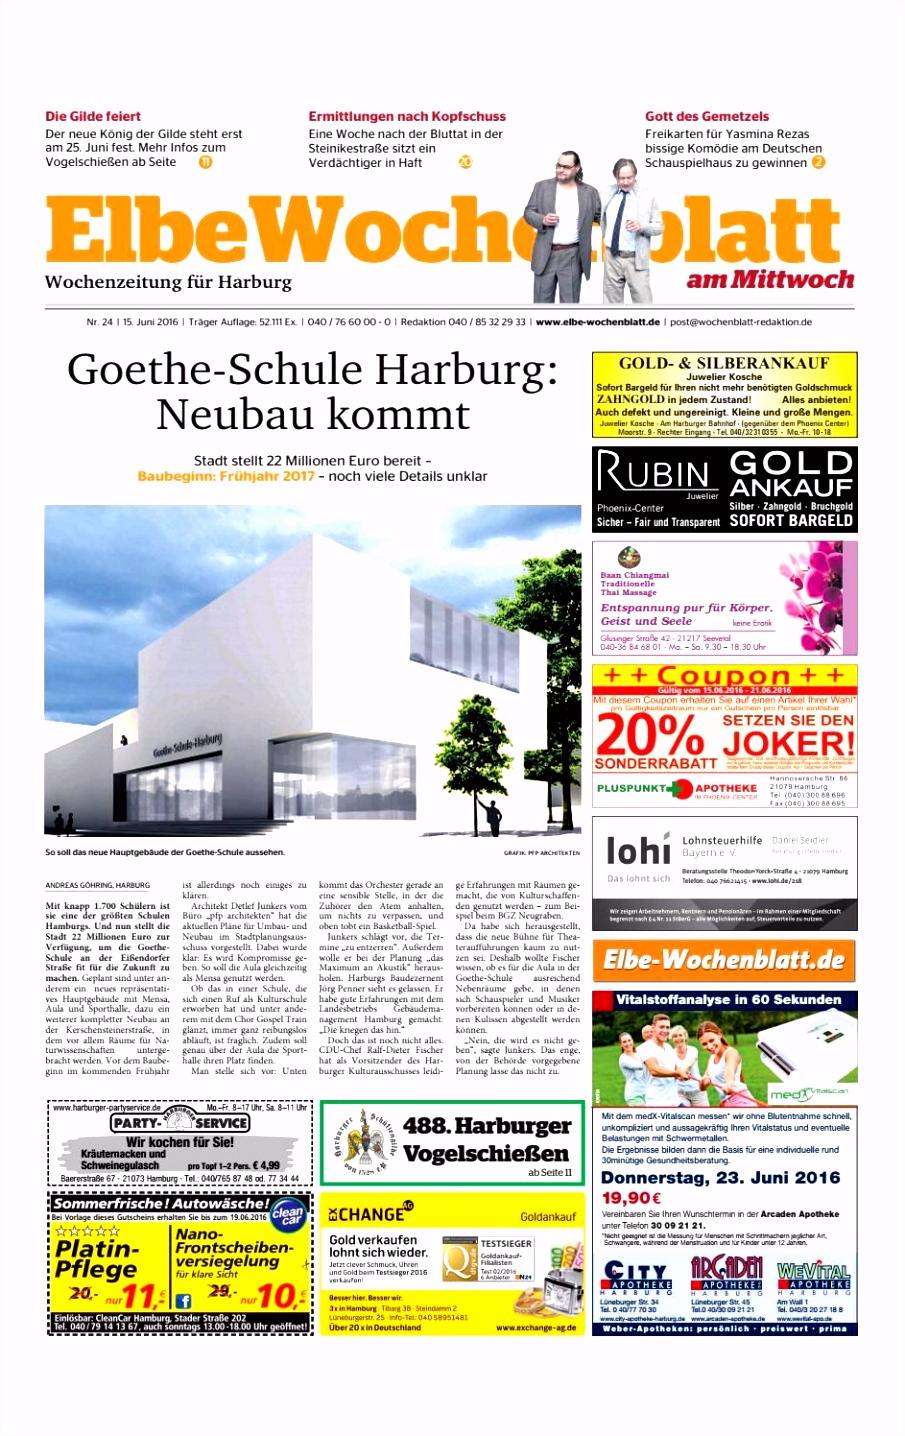 Harburg Kw24 2016 by Elbe Wochenblatt Verlagsgesellschaft Mbh & Co